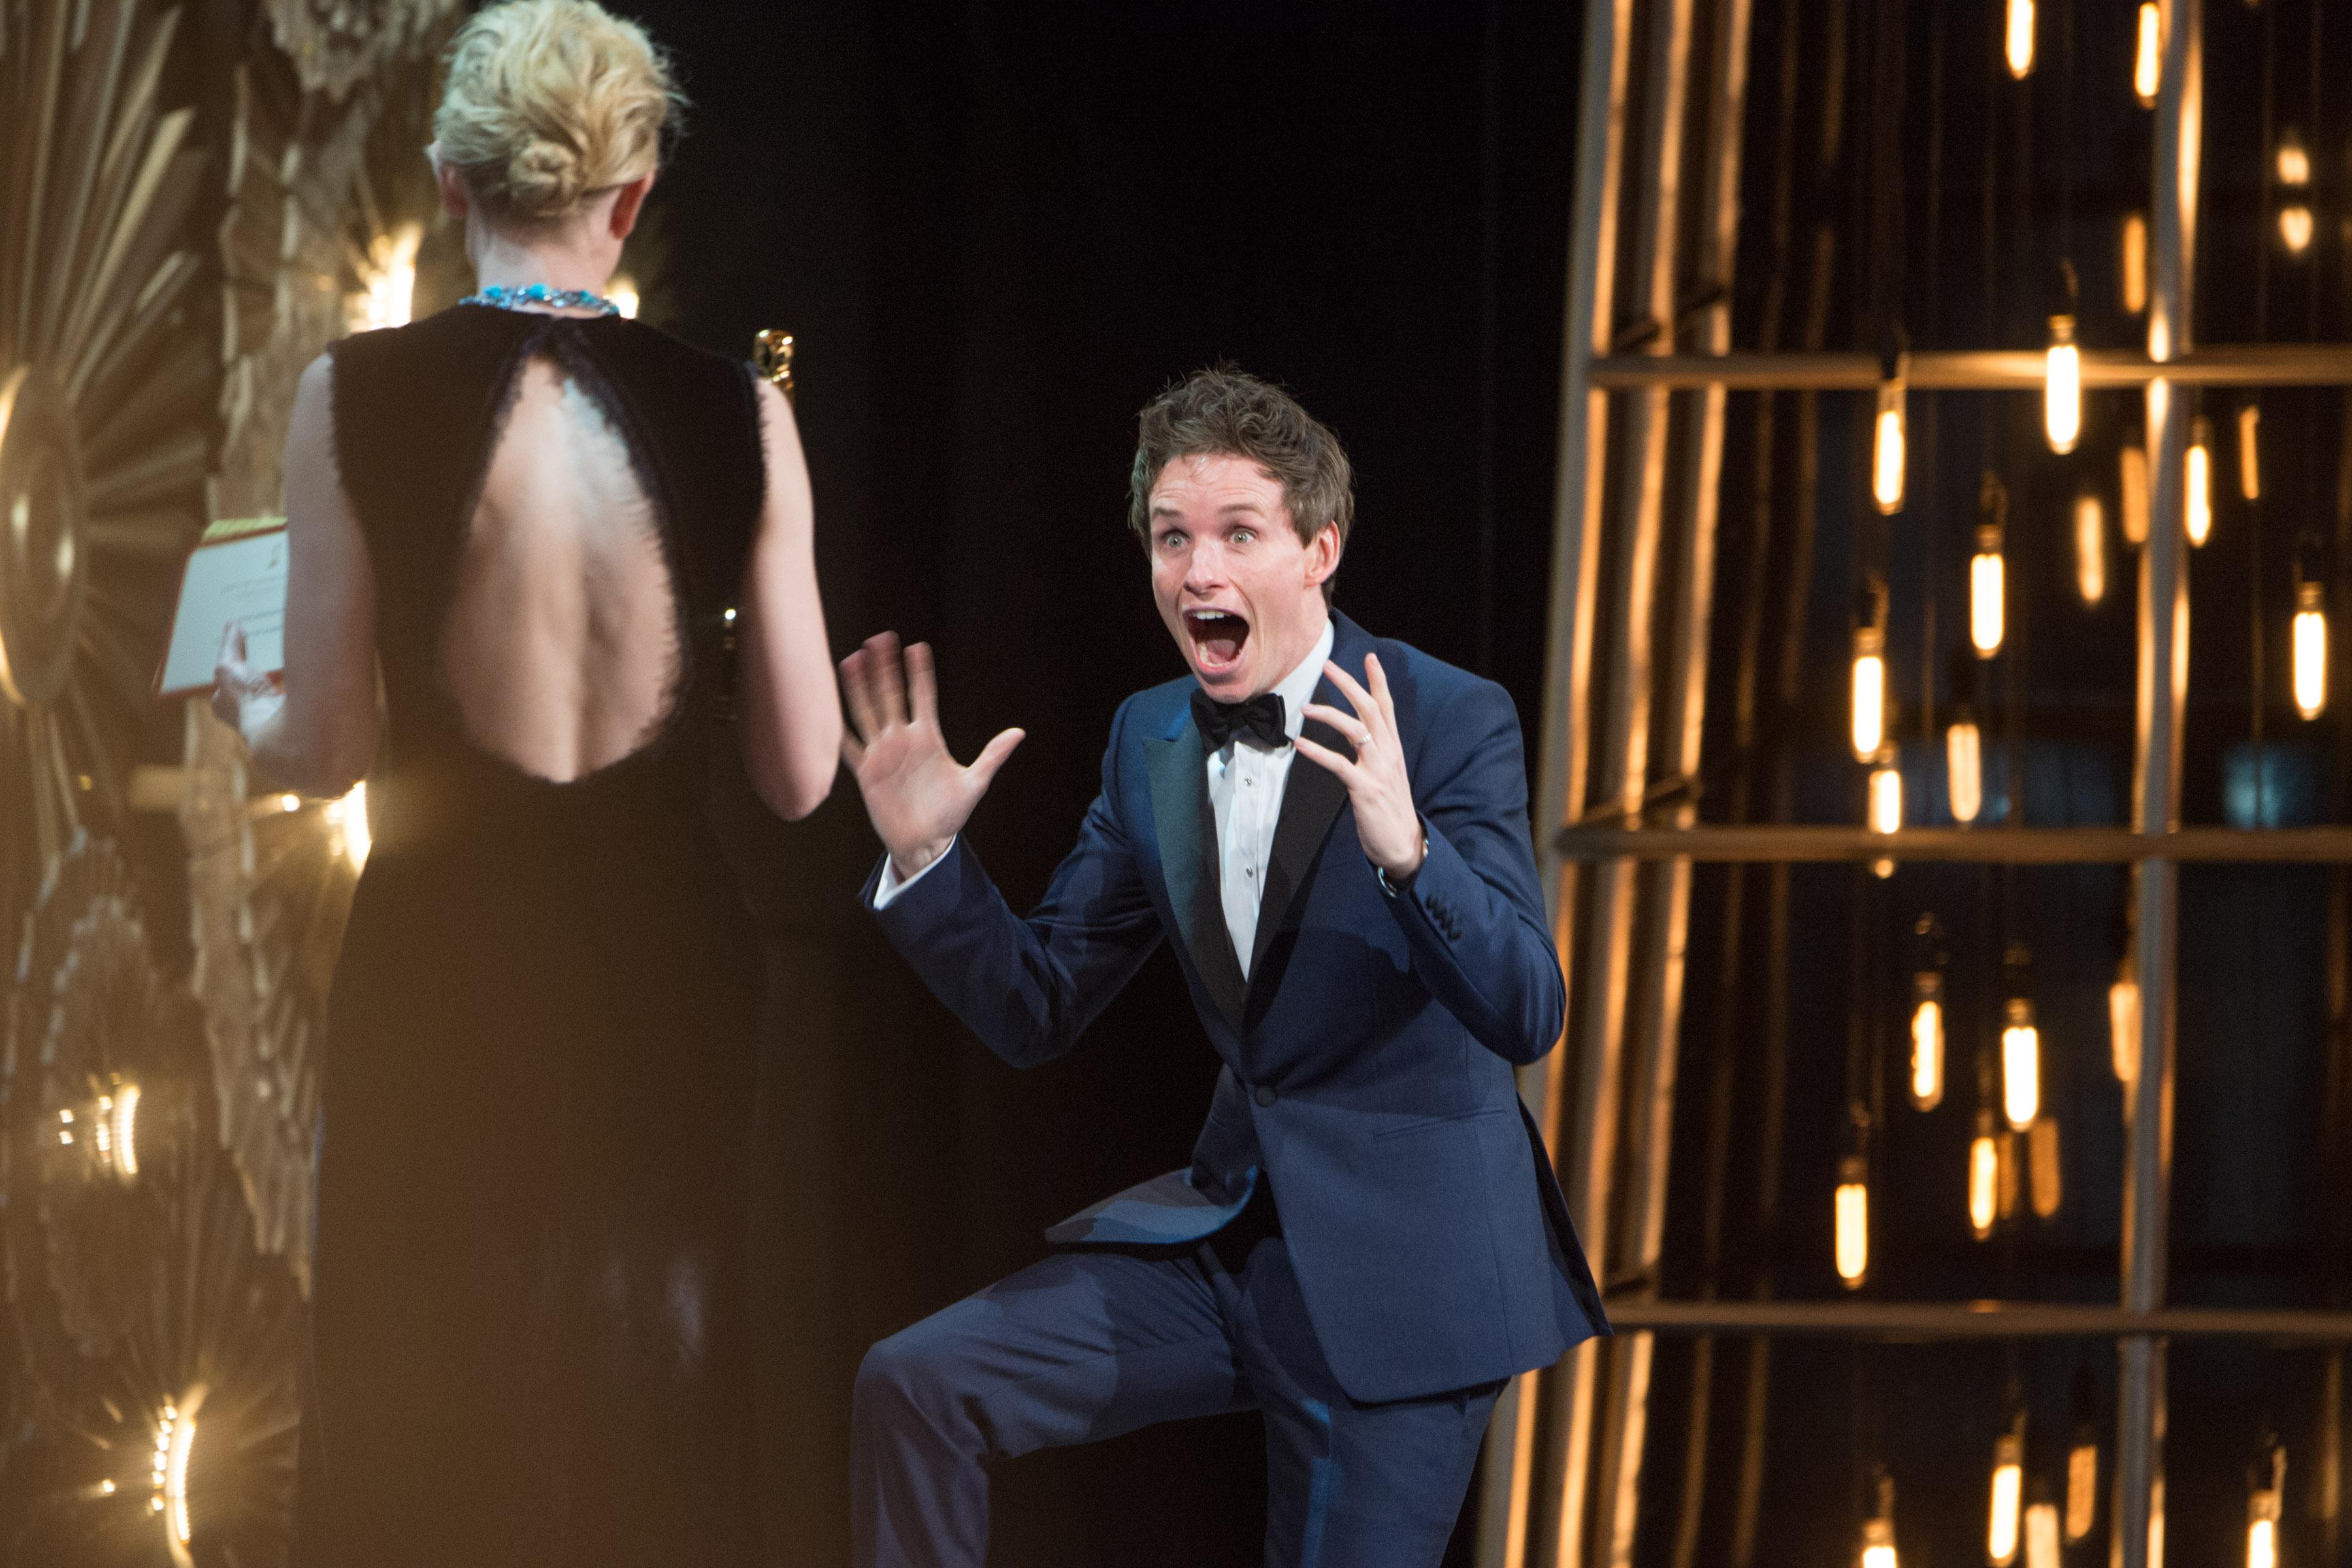 Eddie Redmayne accepts his Oscar. Photo: REX